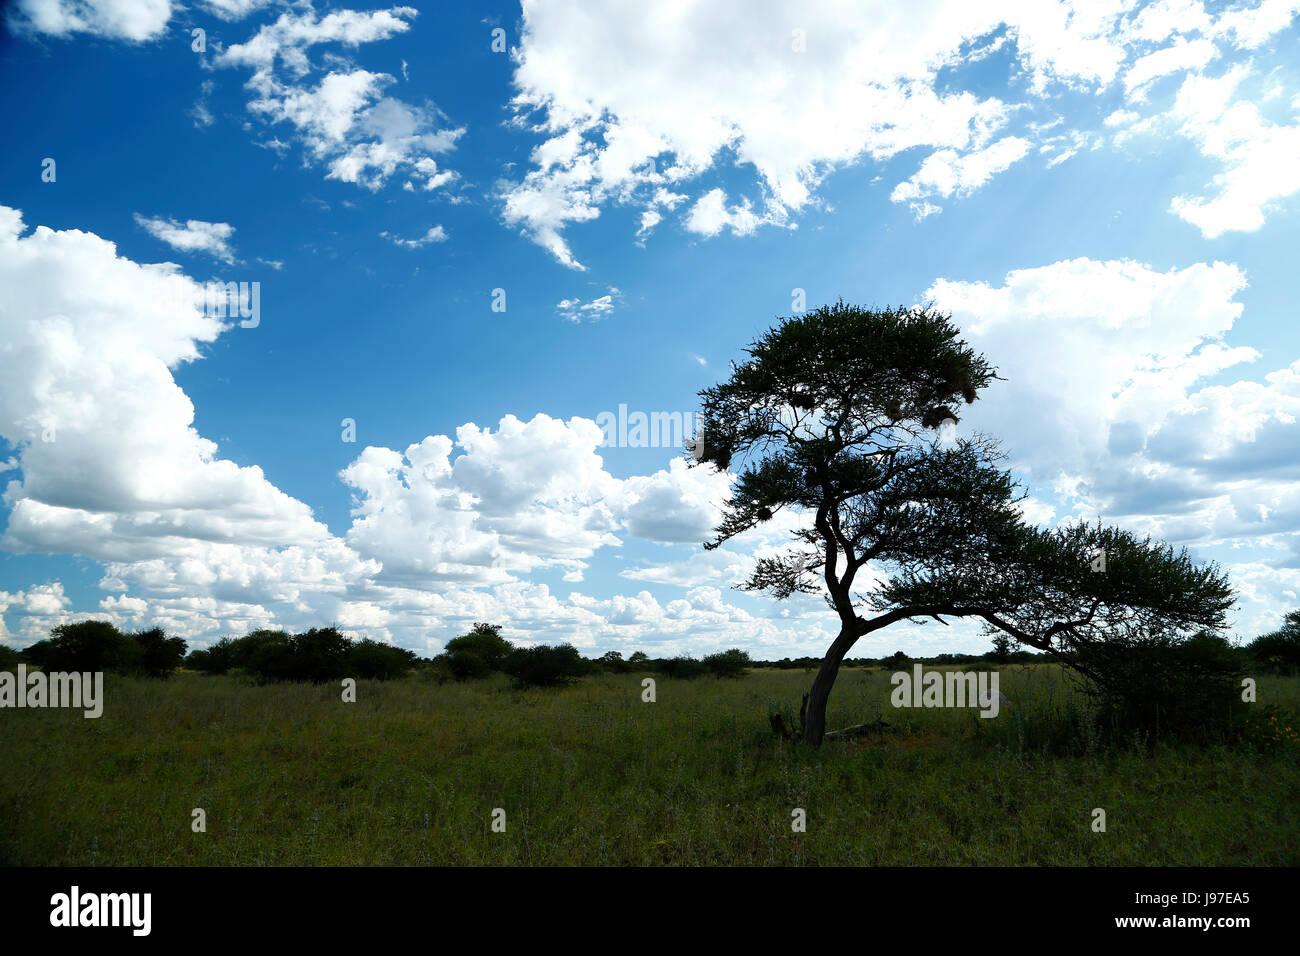 Beautiful landscape of the green Central Kalahari desert during the rainy season - Stock Image